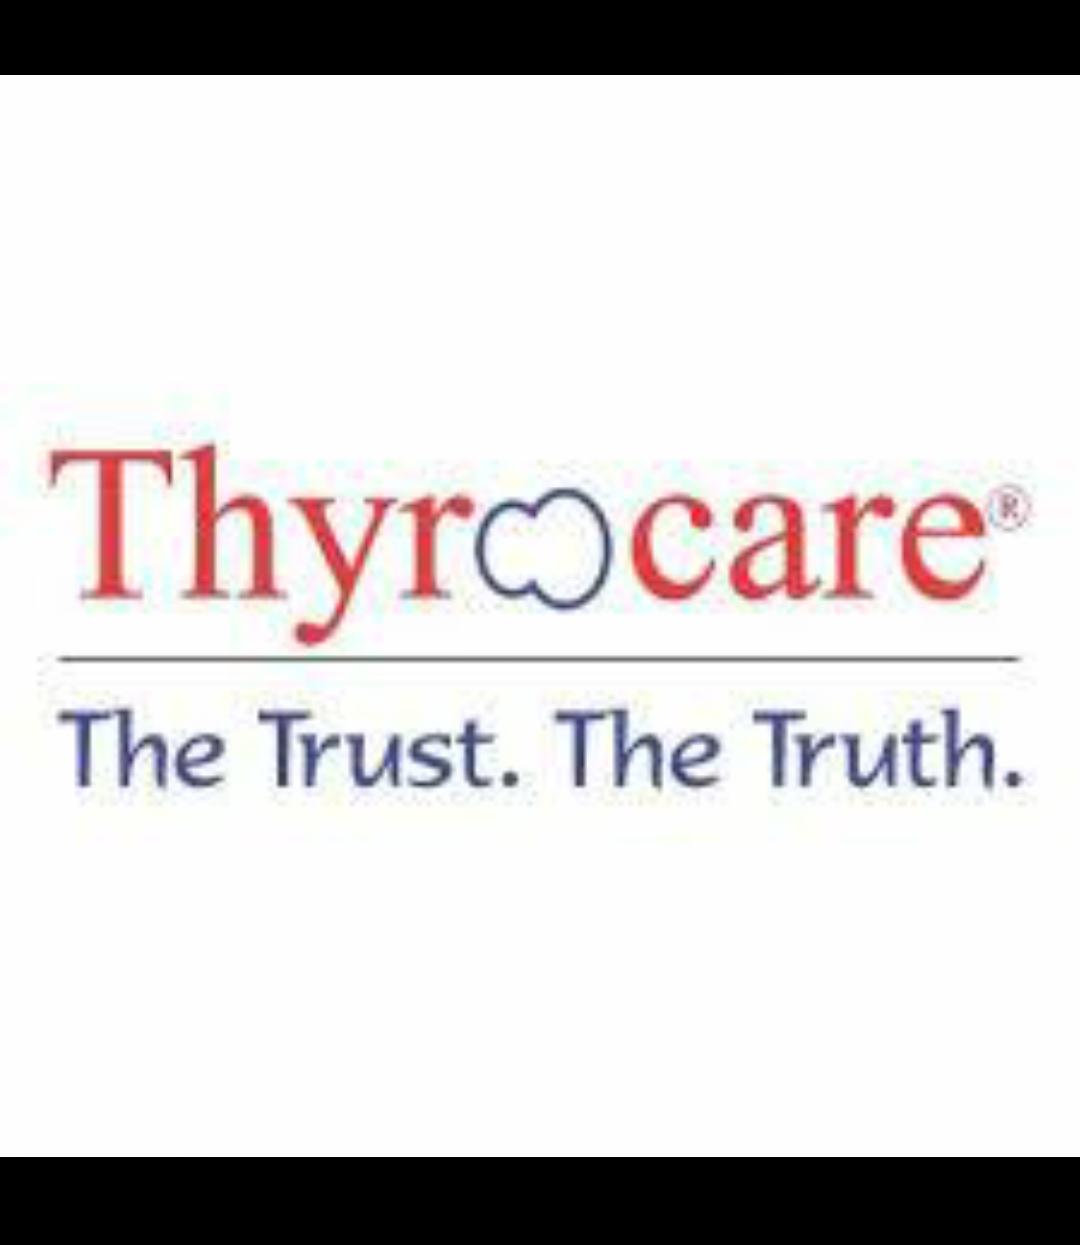 blood bank Thyrocare Collection Centre near Ahmednagar Maharashtra